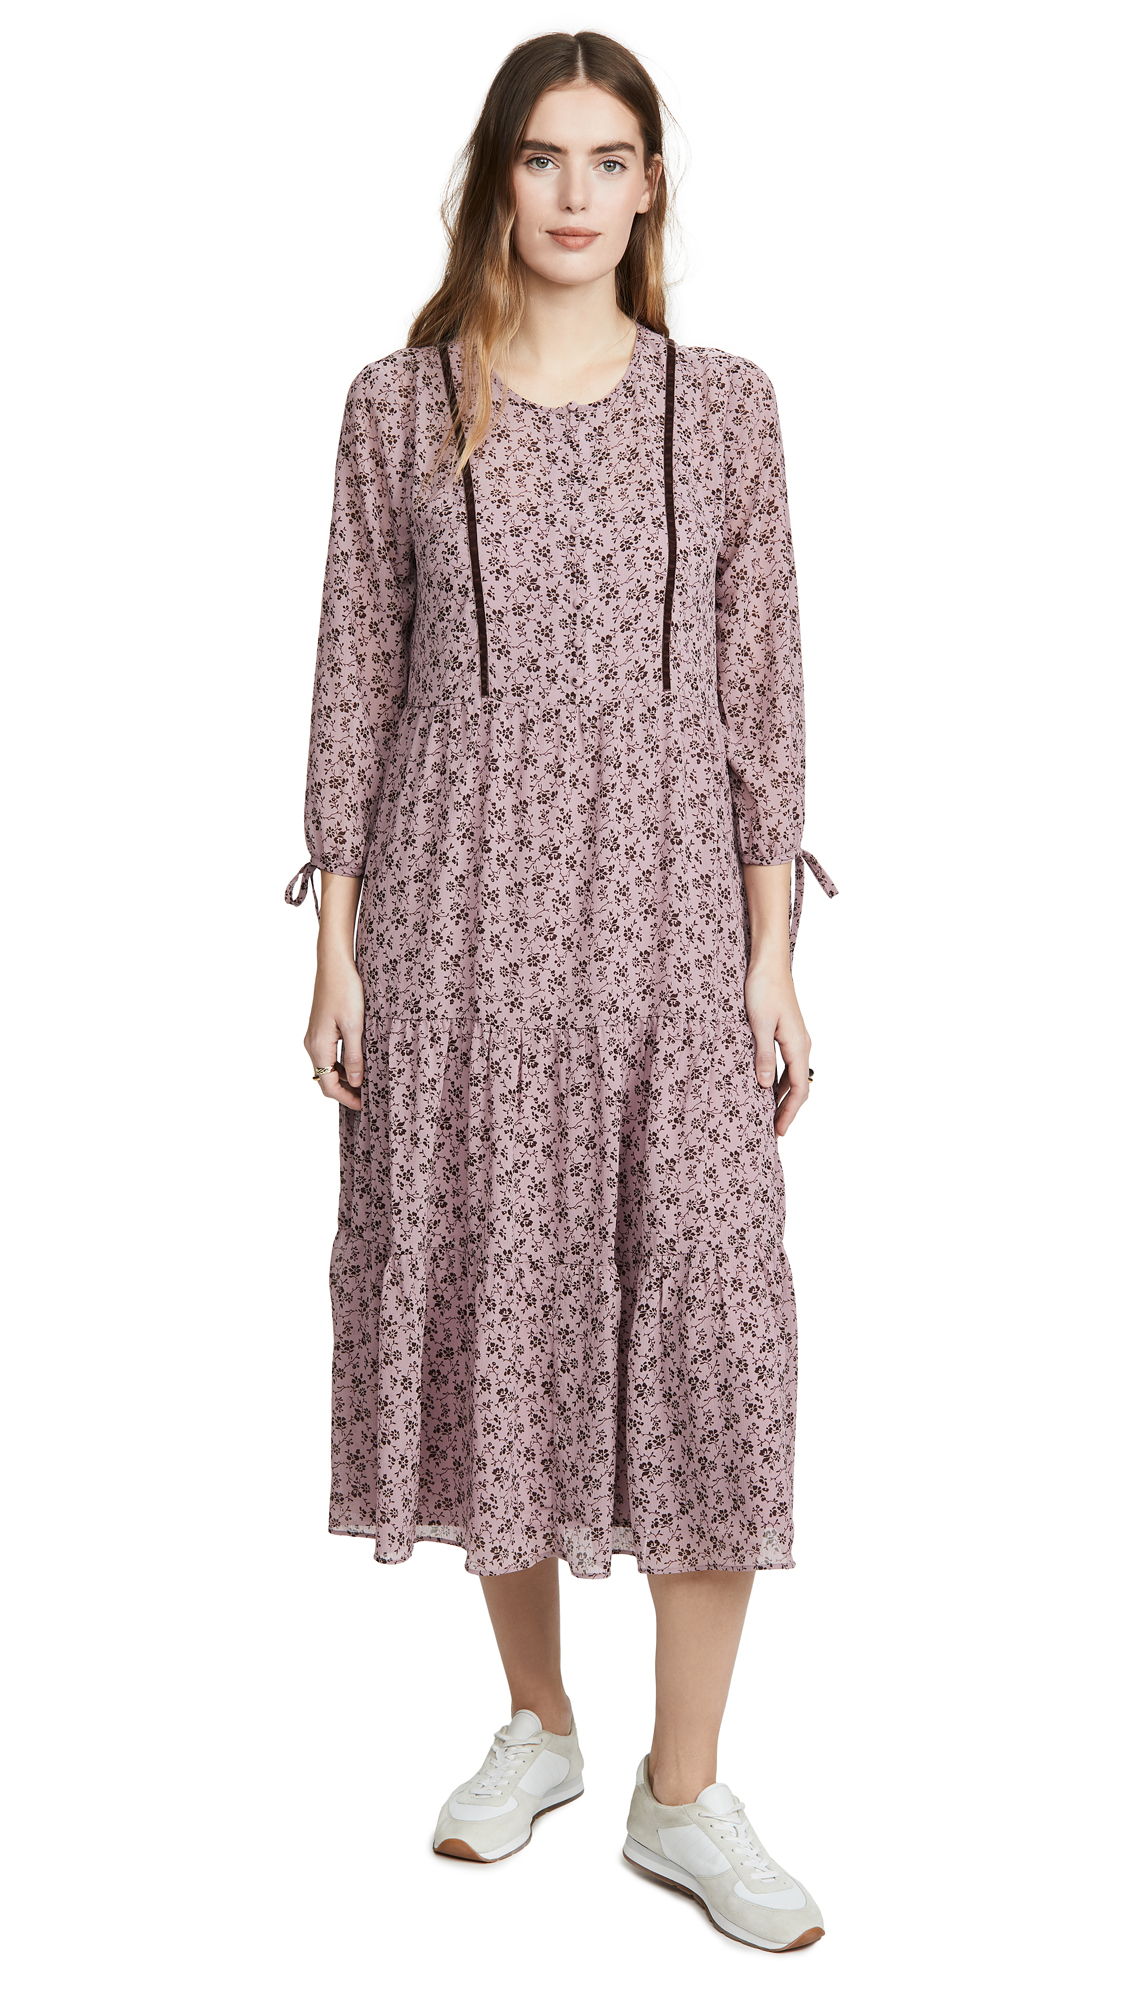 Madewell Tiered Midi Dress - 30% Off Sale